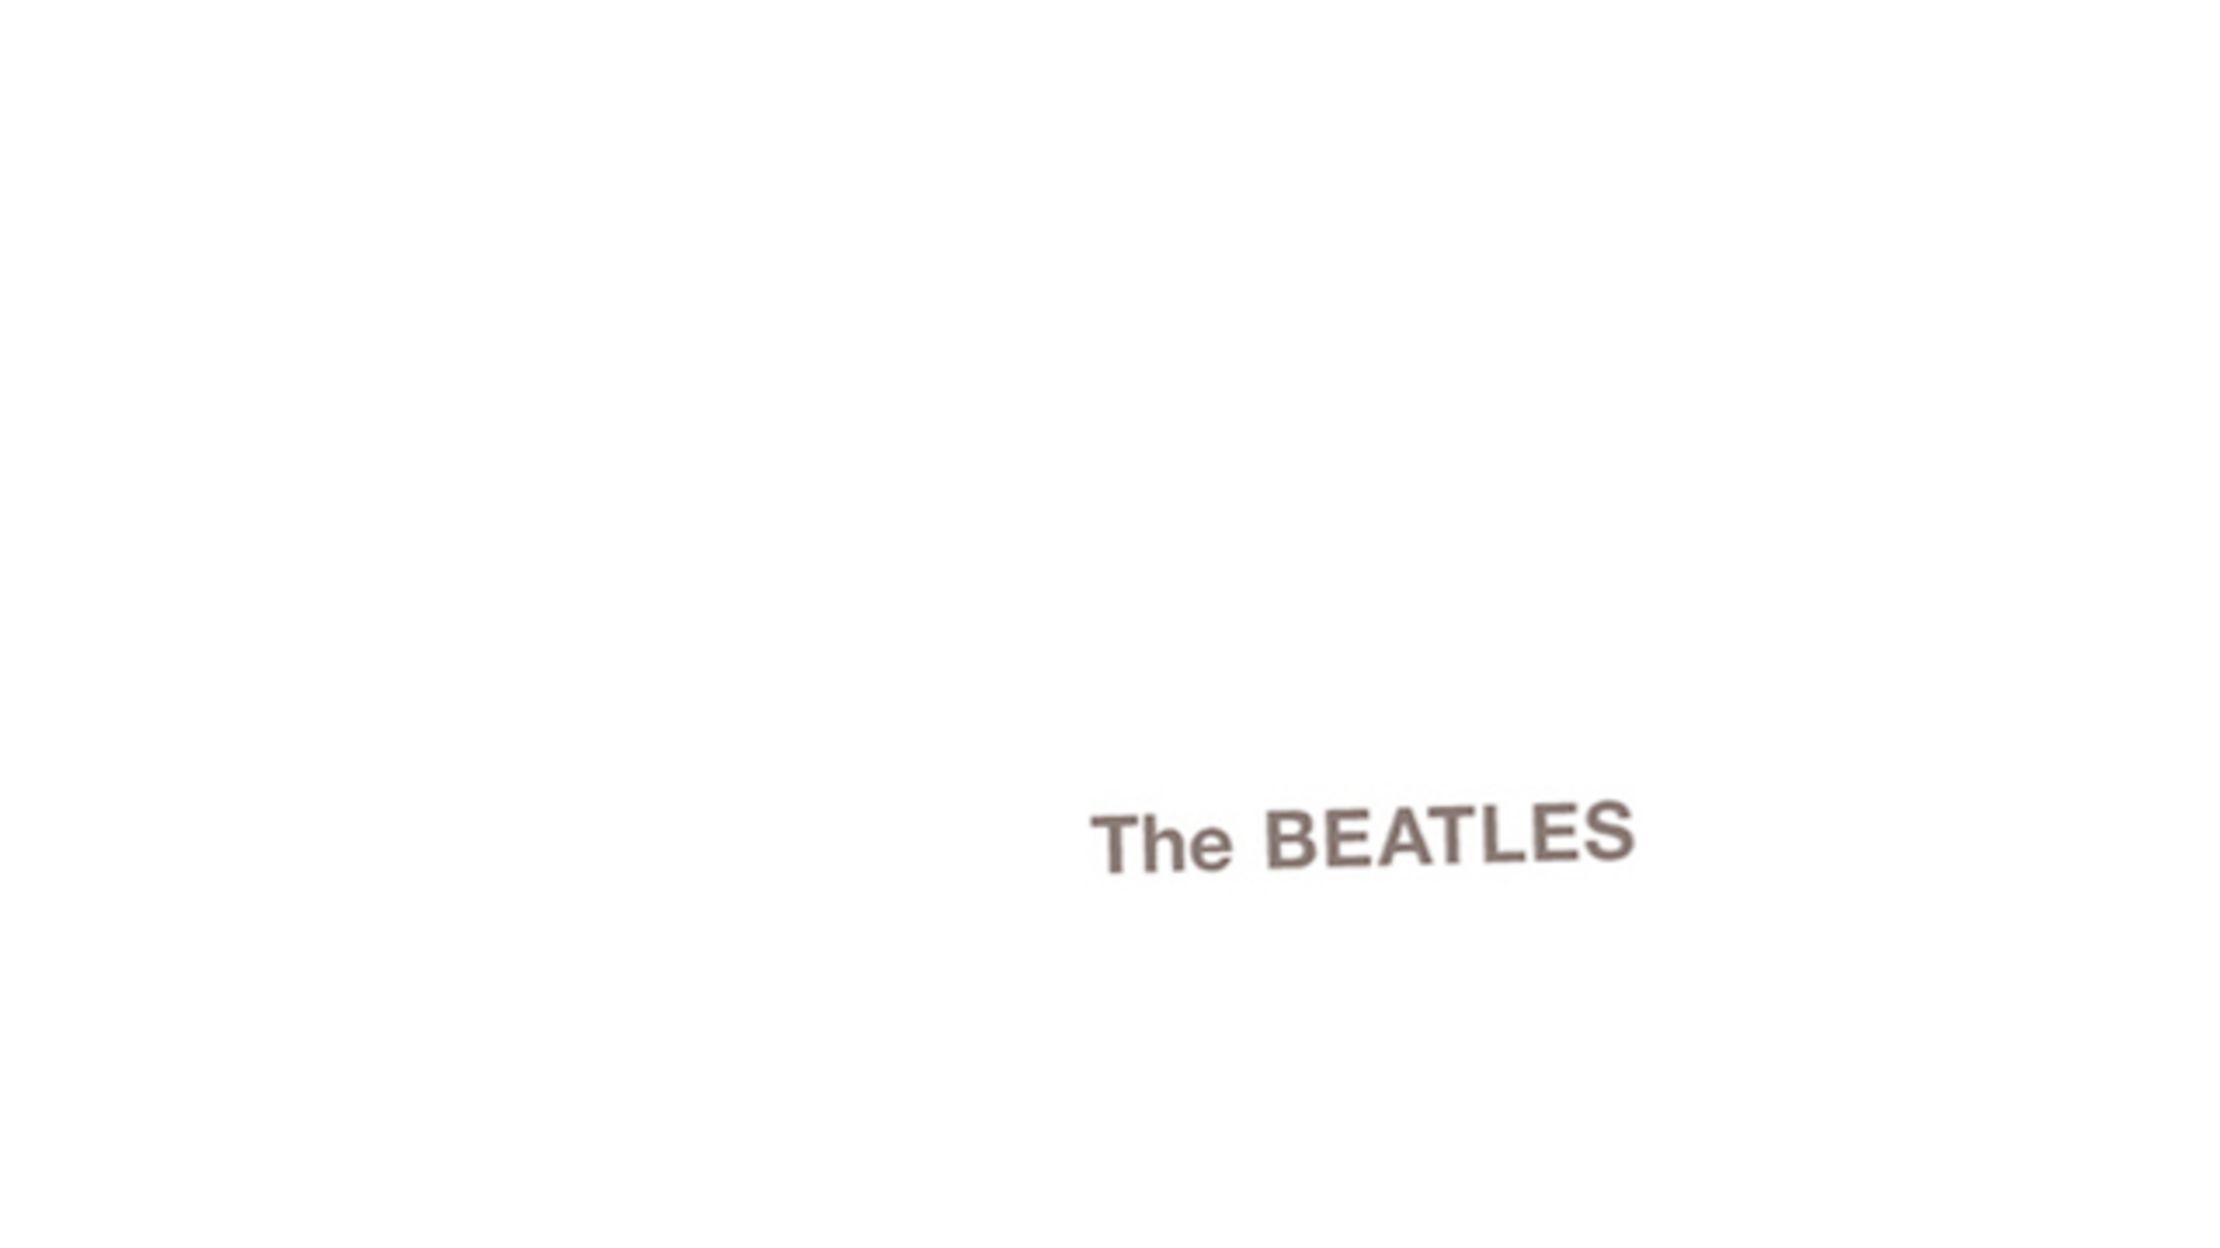 17 Colorful Facts About The Beatles' <em>White Album</em>